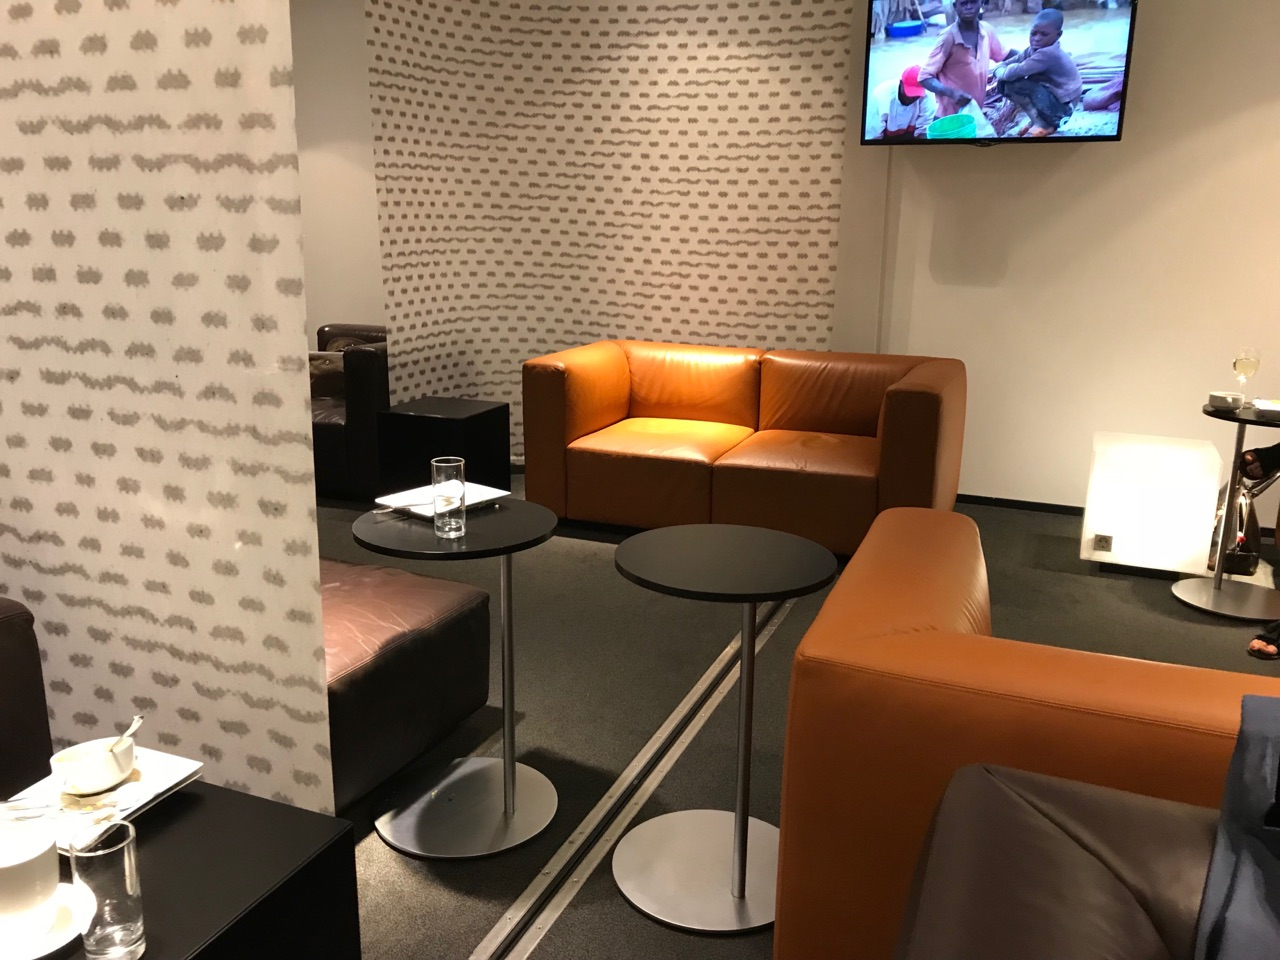 В бизнес-зале Sky Lounge в терминале 3 аэропорта Вена Швехат